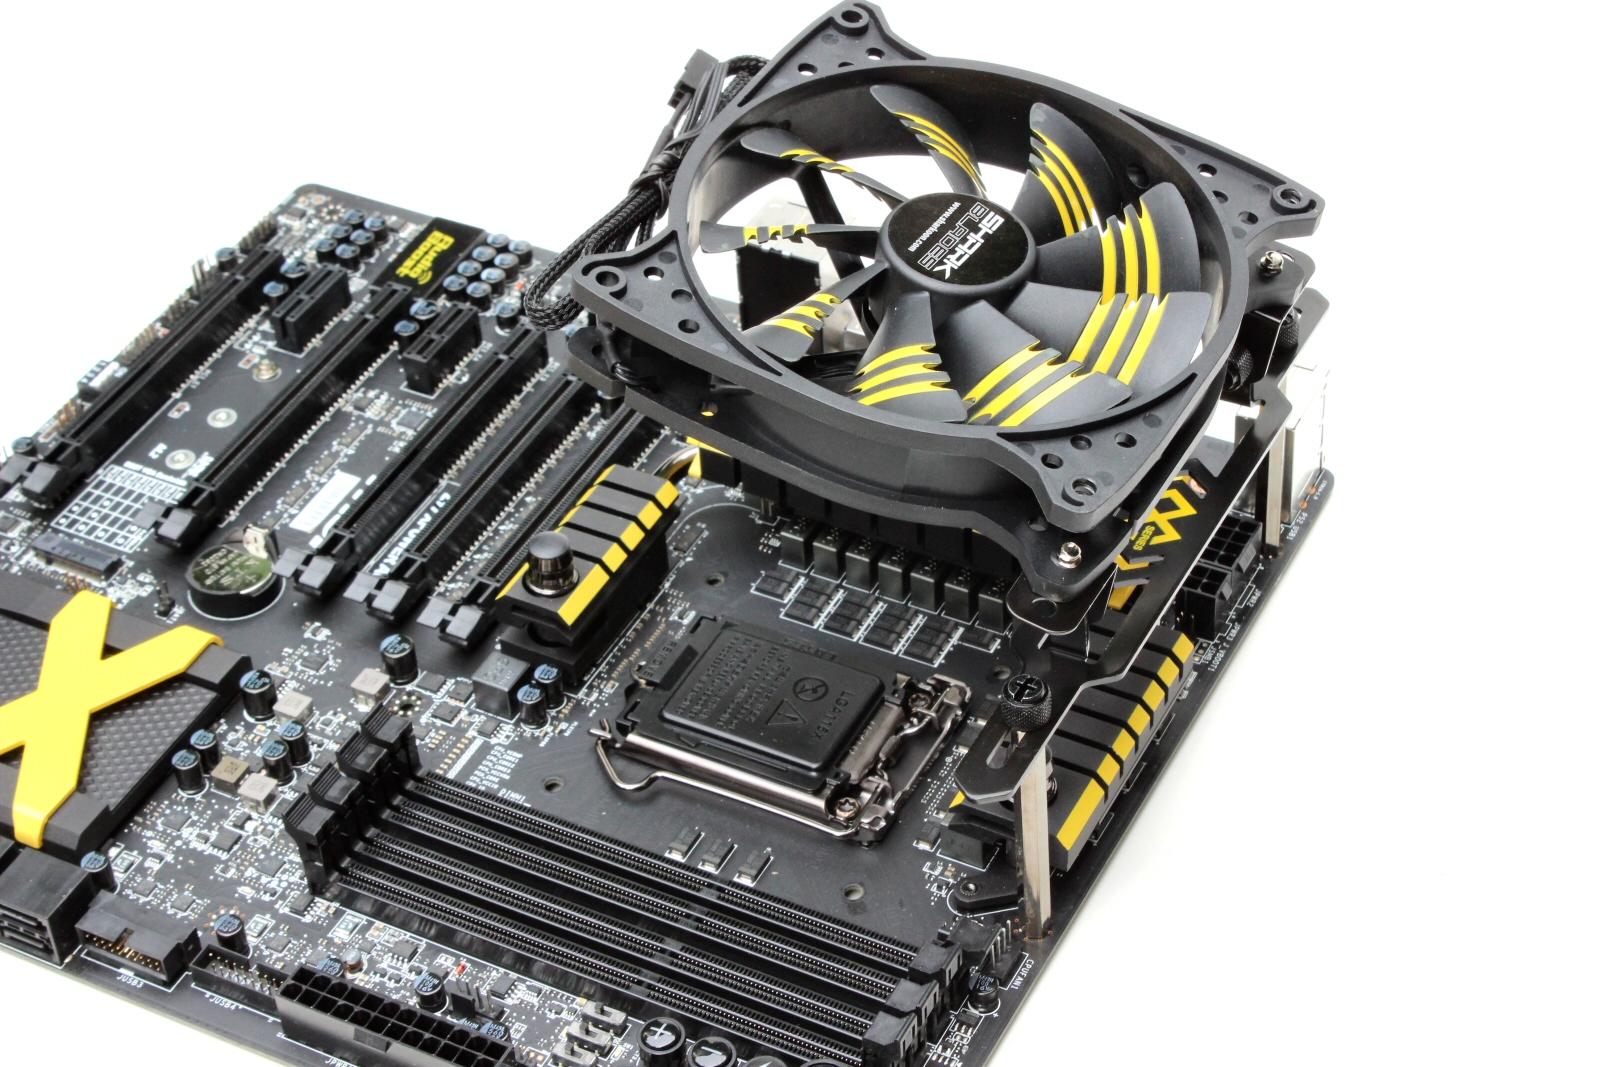 [Review] MSI Z97 XPower AC-img_5257.jpg